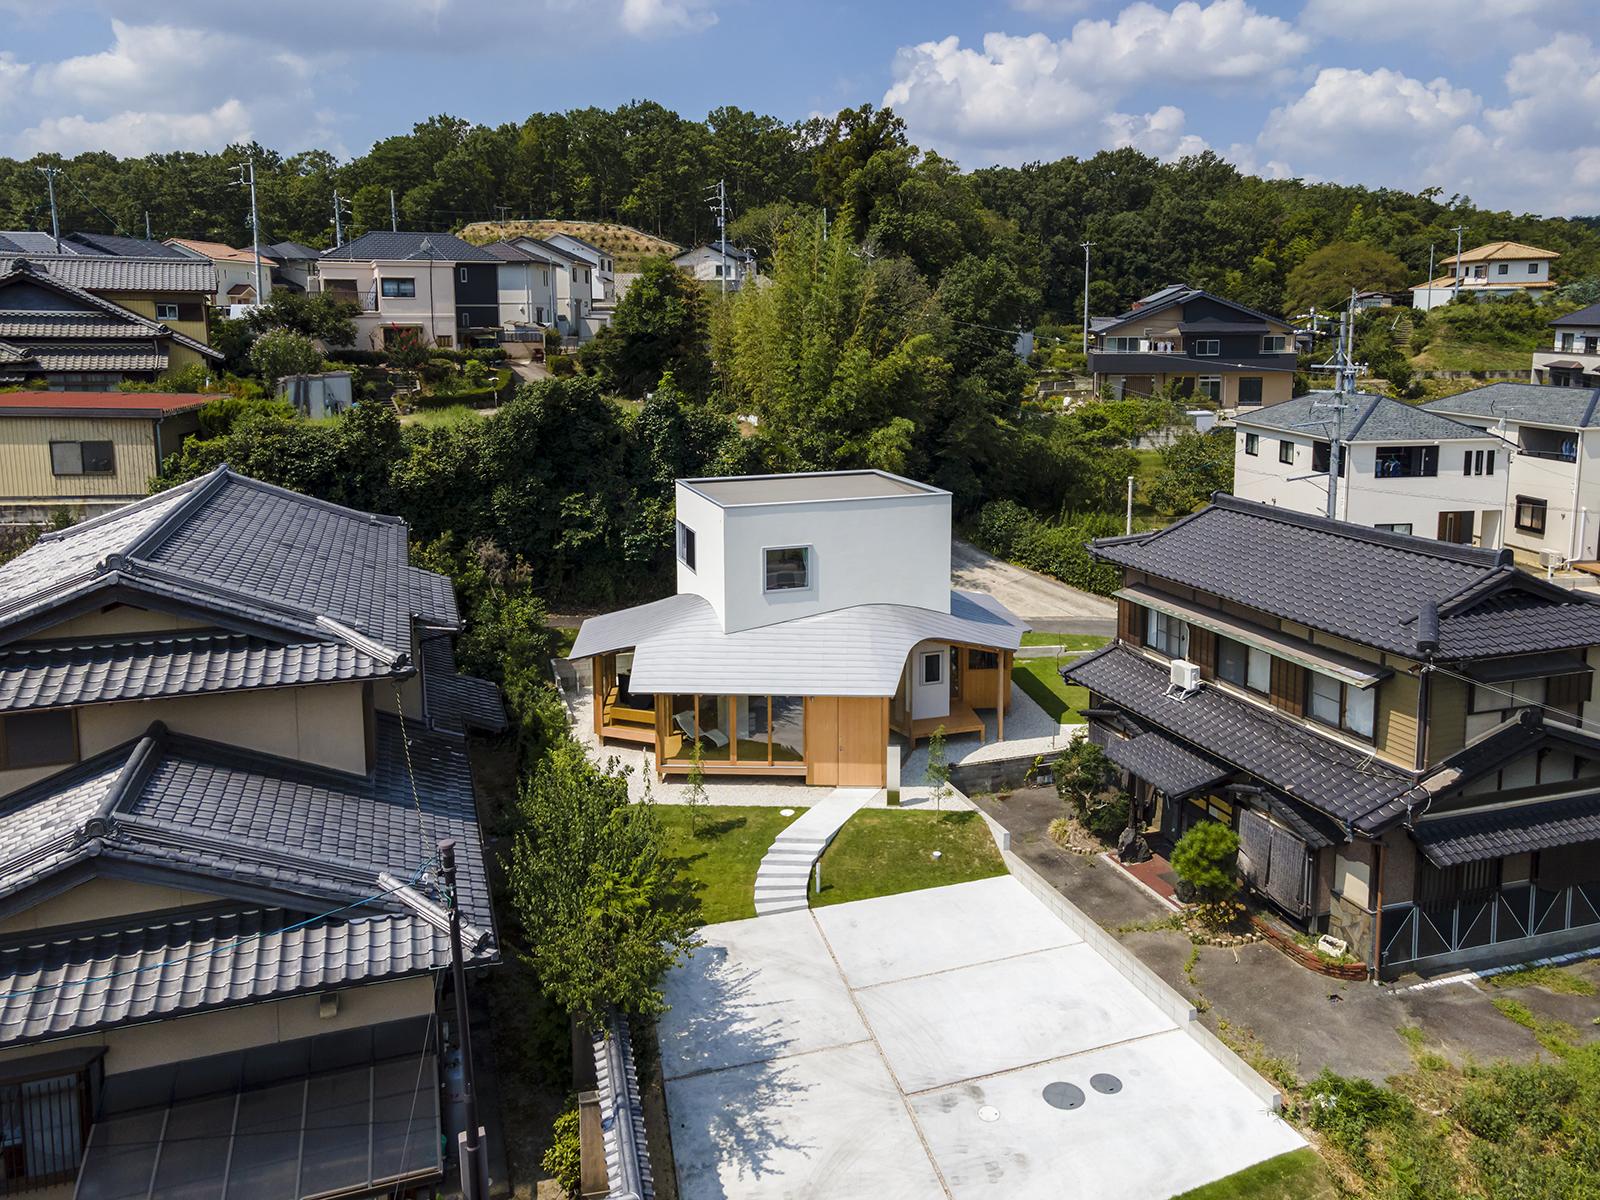 Morimoto House